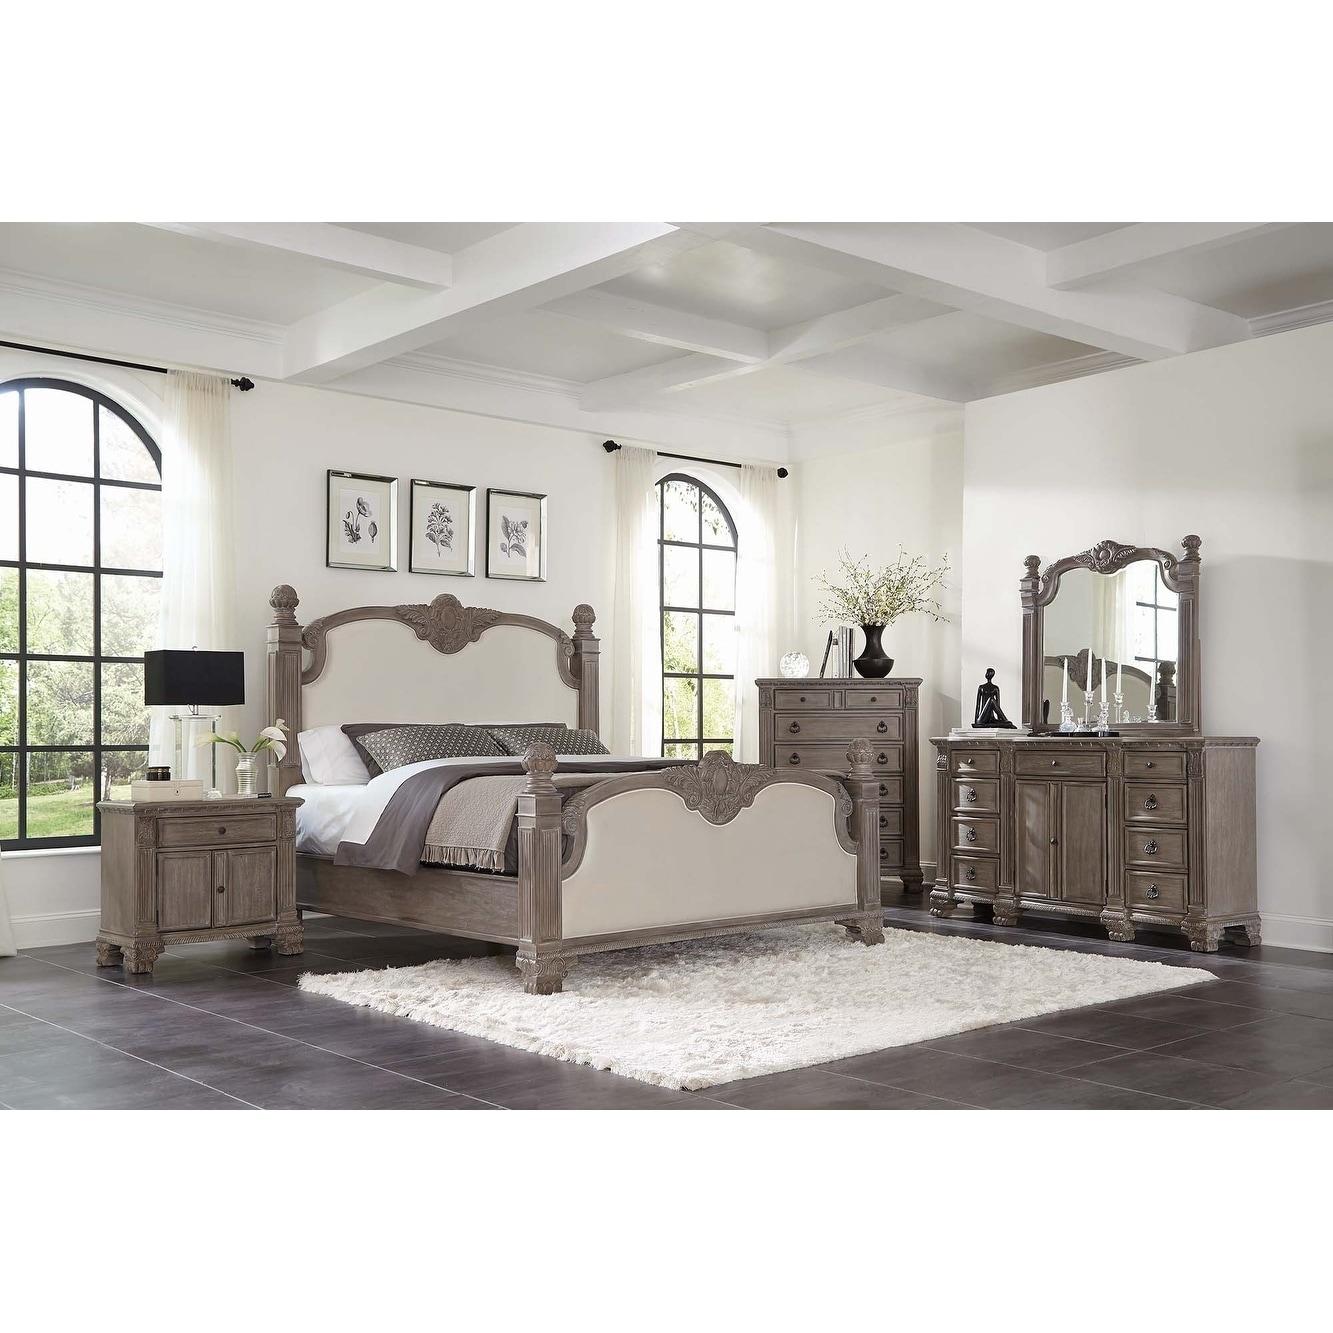 Shop Carbon Loft Chambliss Vintage Grey 5-piece Upholstered Bedroom ...